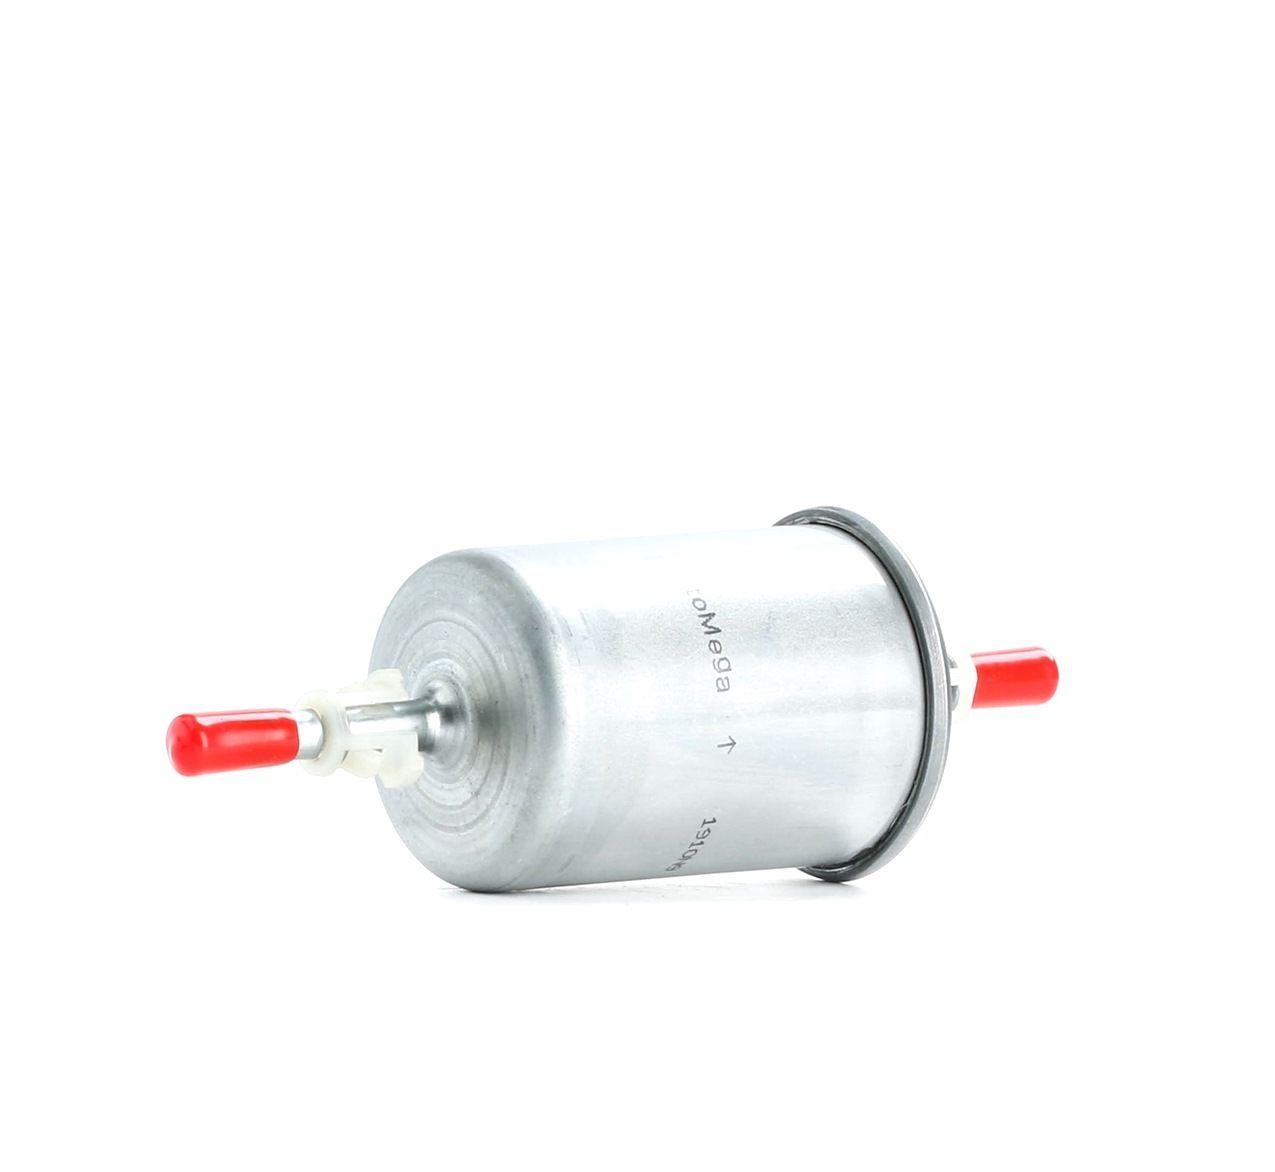 Fuel filter AUTOMEGA 180009510 rating